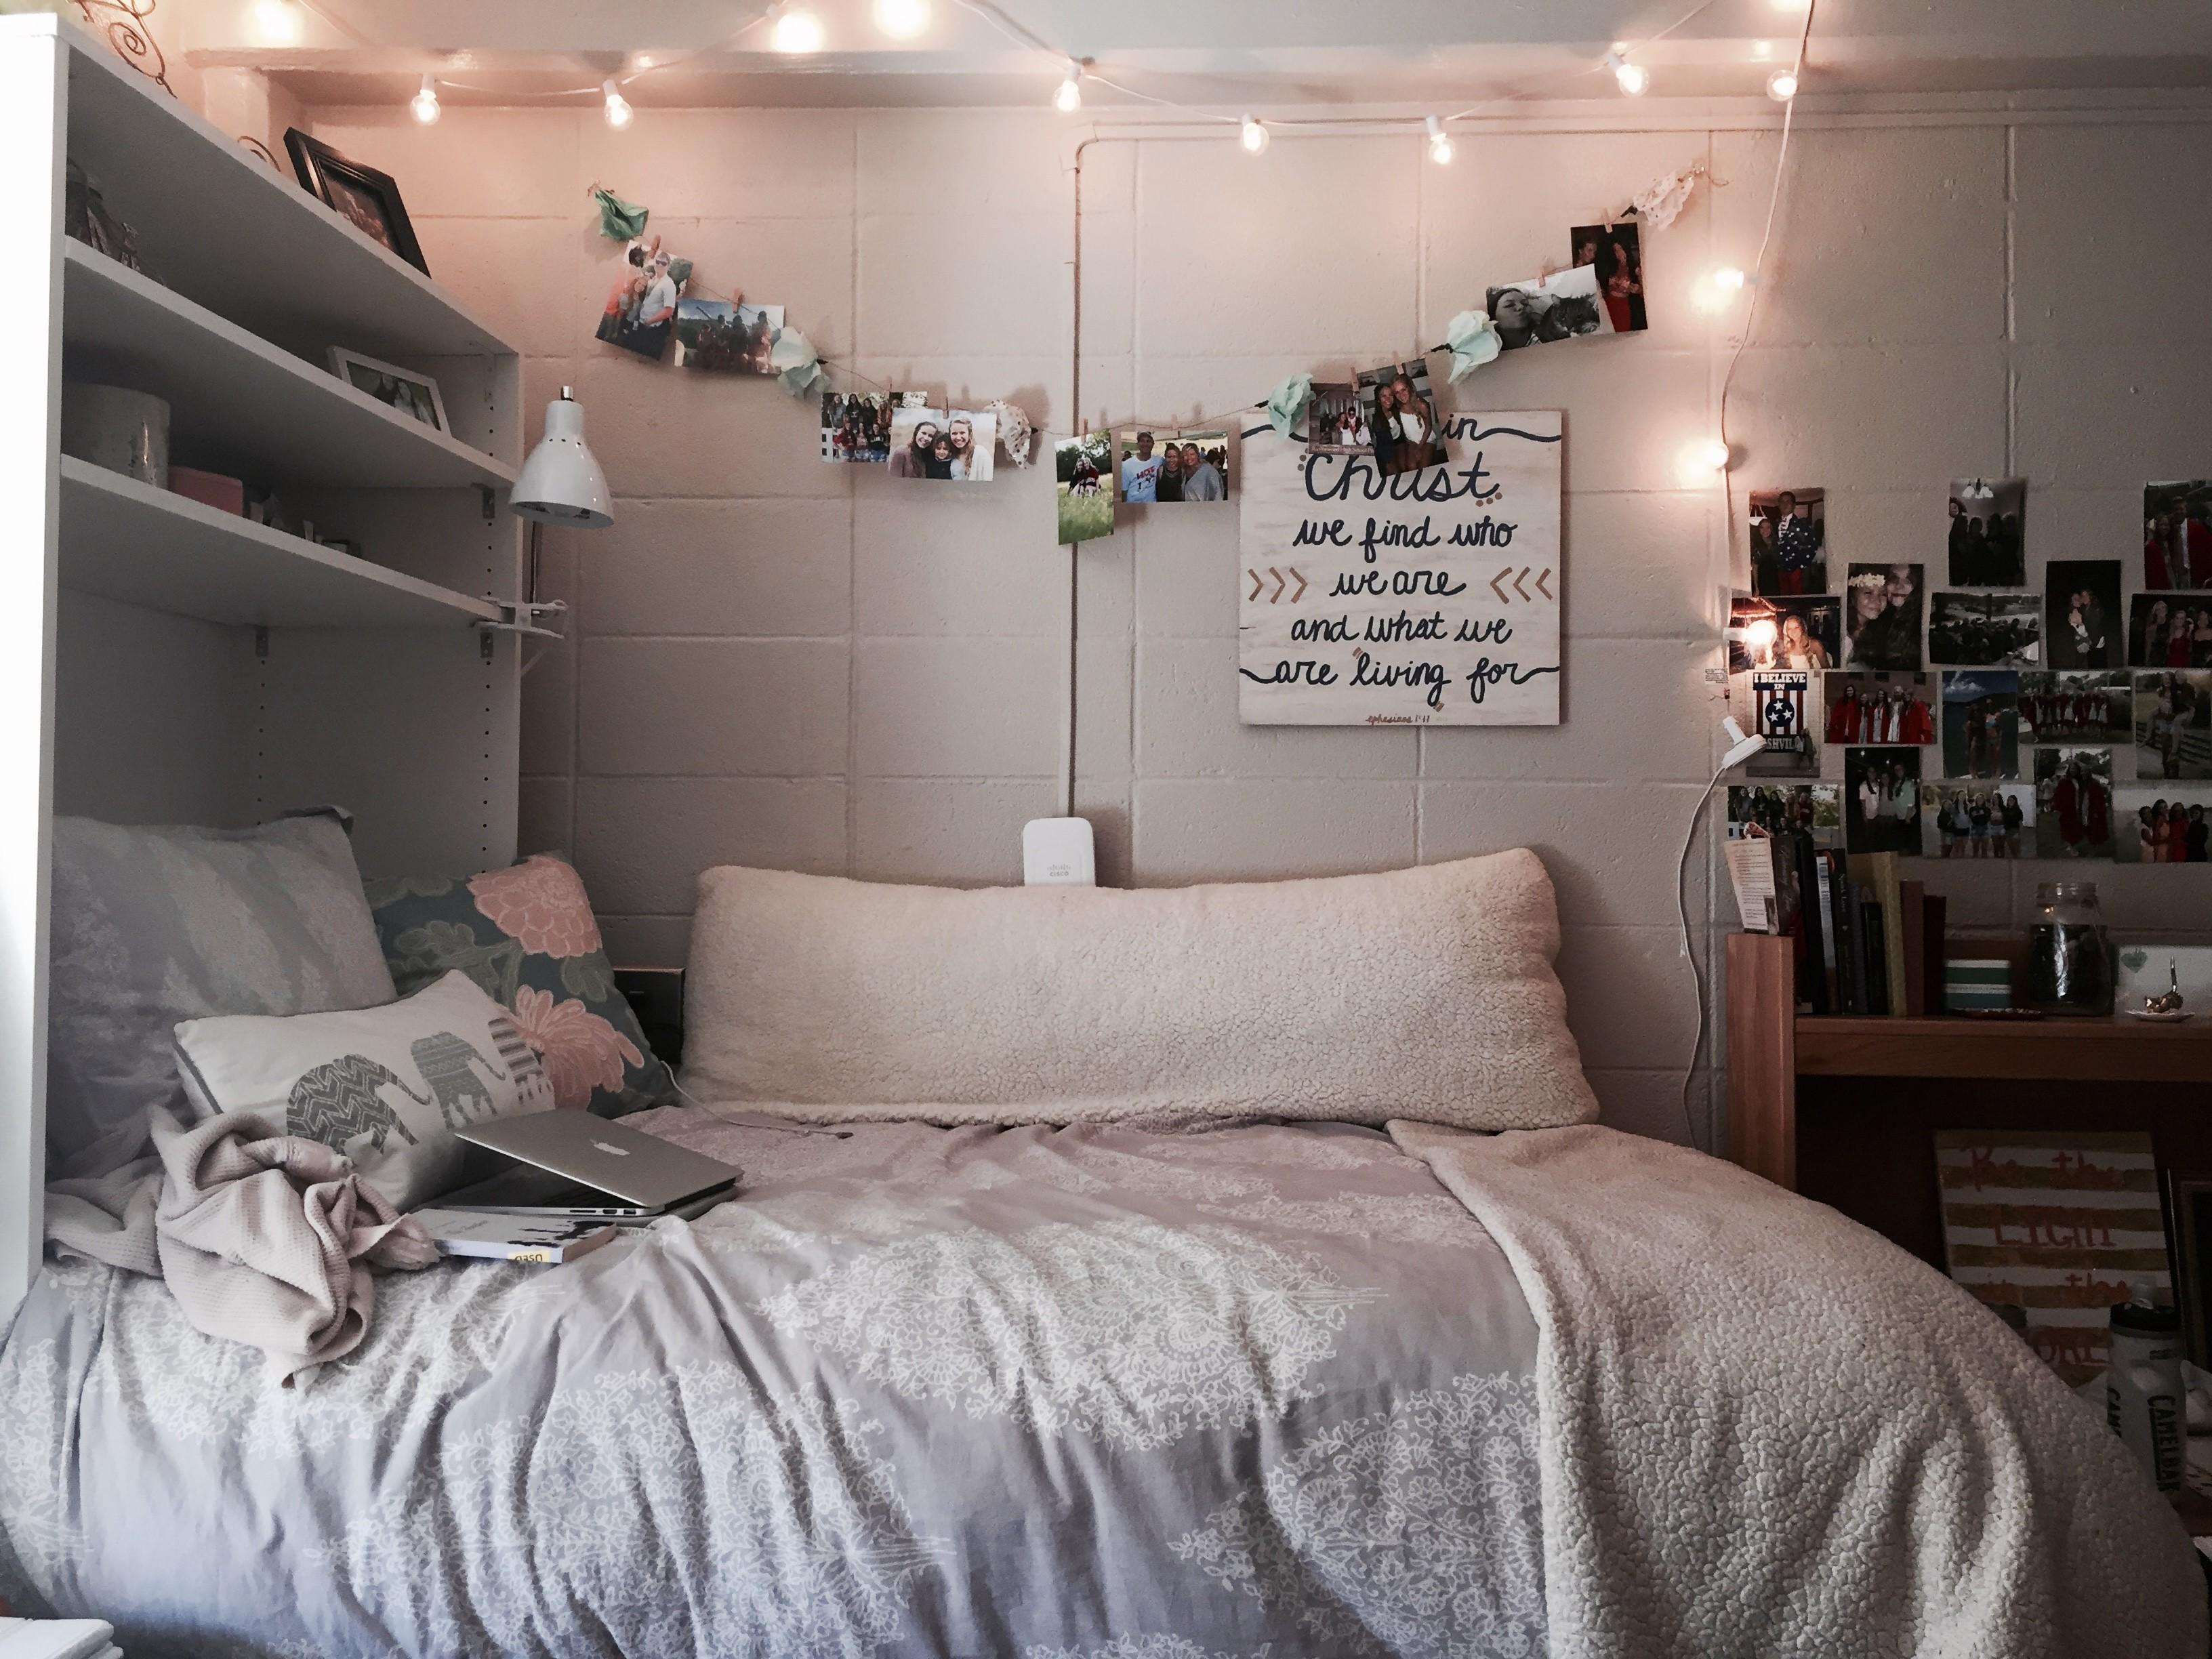 Tumblr Bedroom Decor Awesome Ideas Magnificent Decoratorist 83446